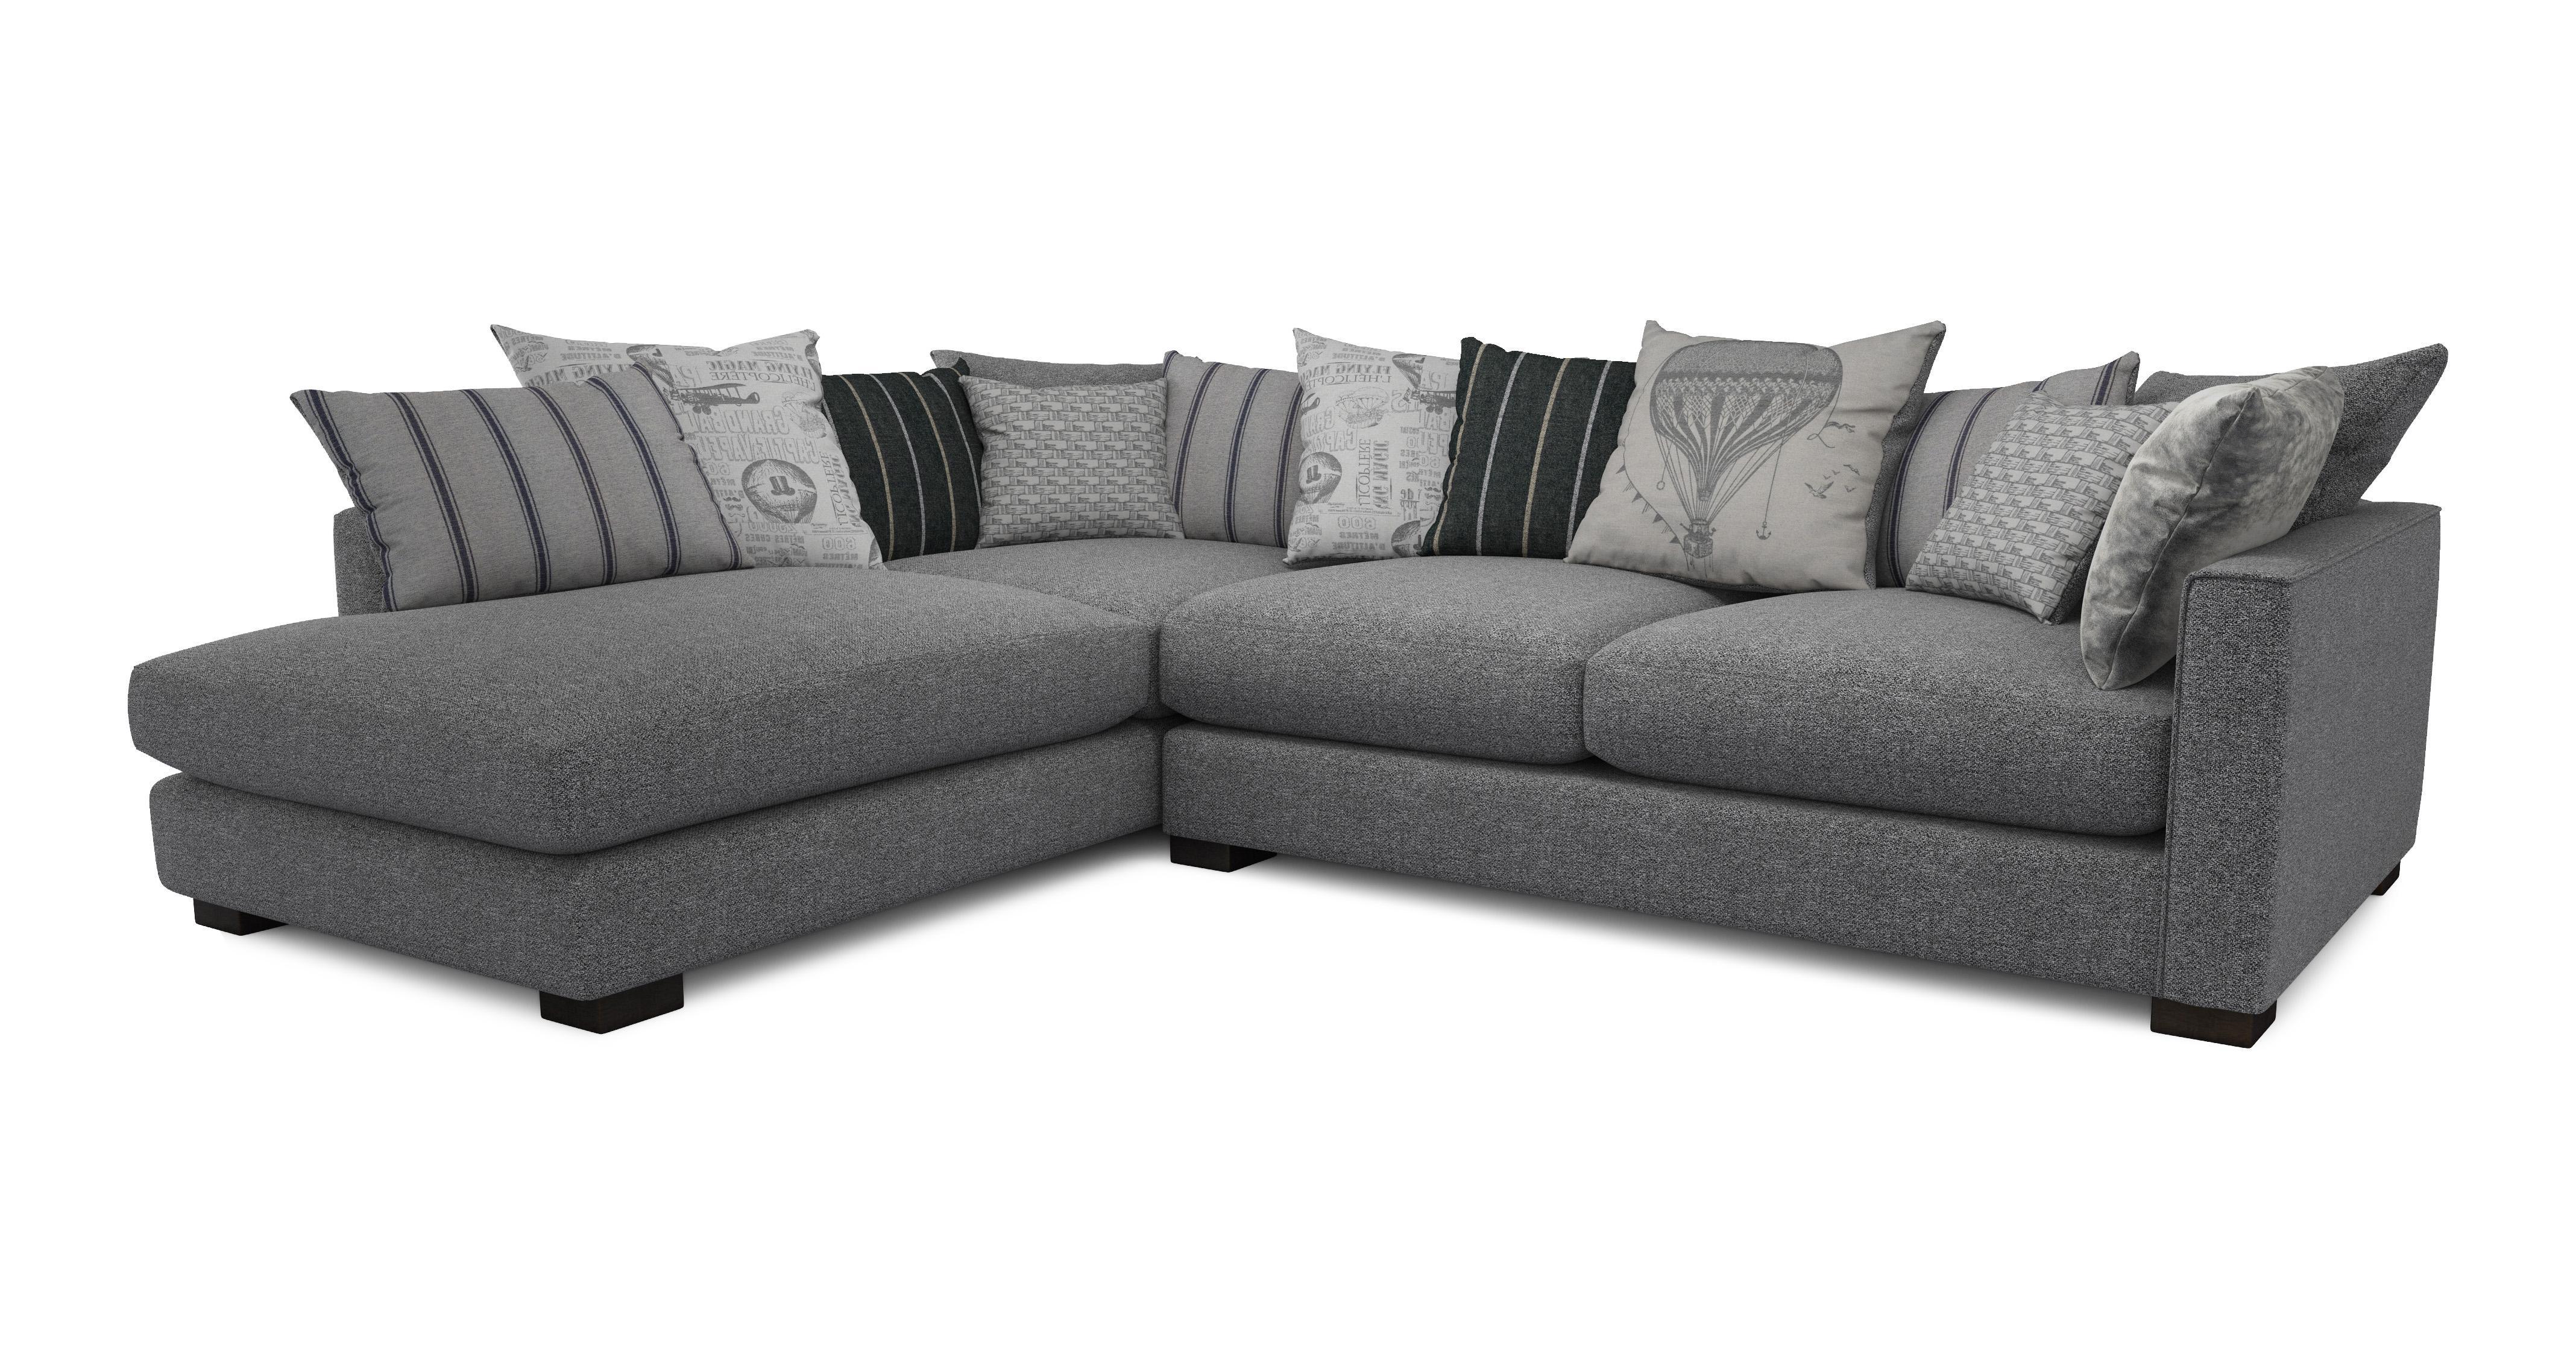 dfs corner sofa grey fabric modern white leather textile queen sleeper k43 2 and armchair zuma range 3